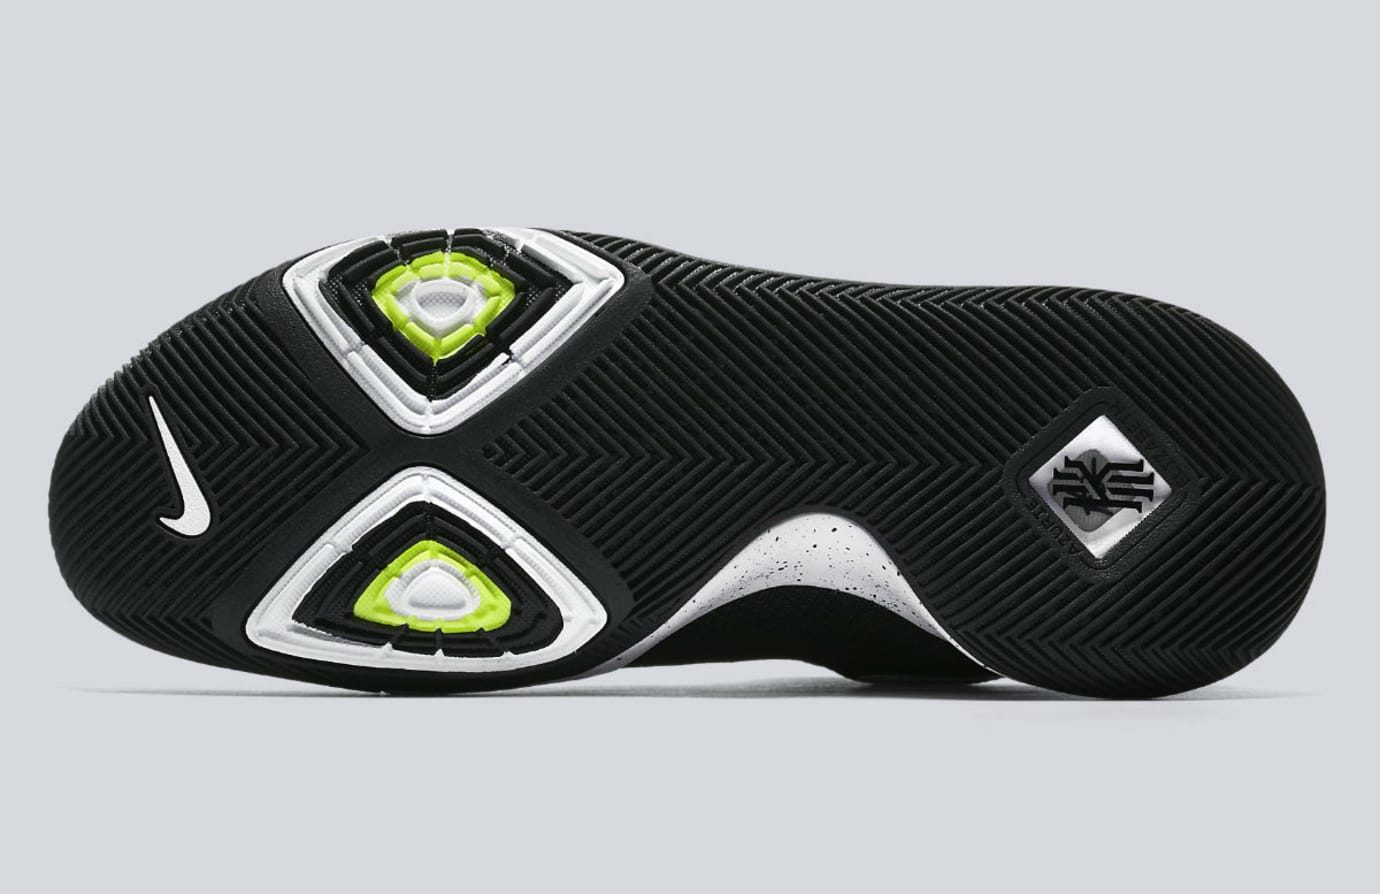 ... amazon nike kyrie 3 black white tuxedo release date sole 917724 001  55436 007d5 discount ... 9b0d1aa89